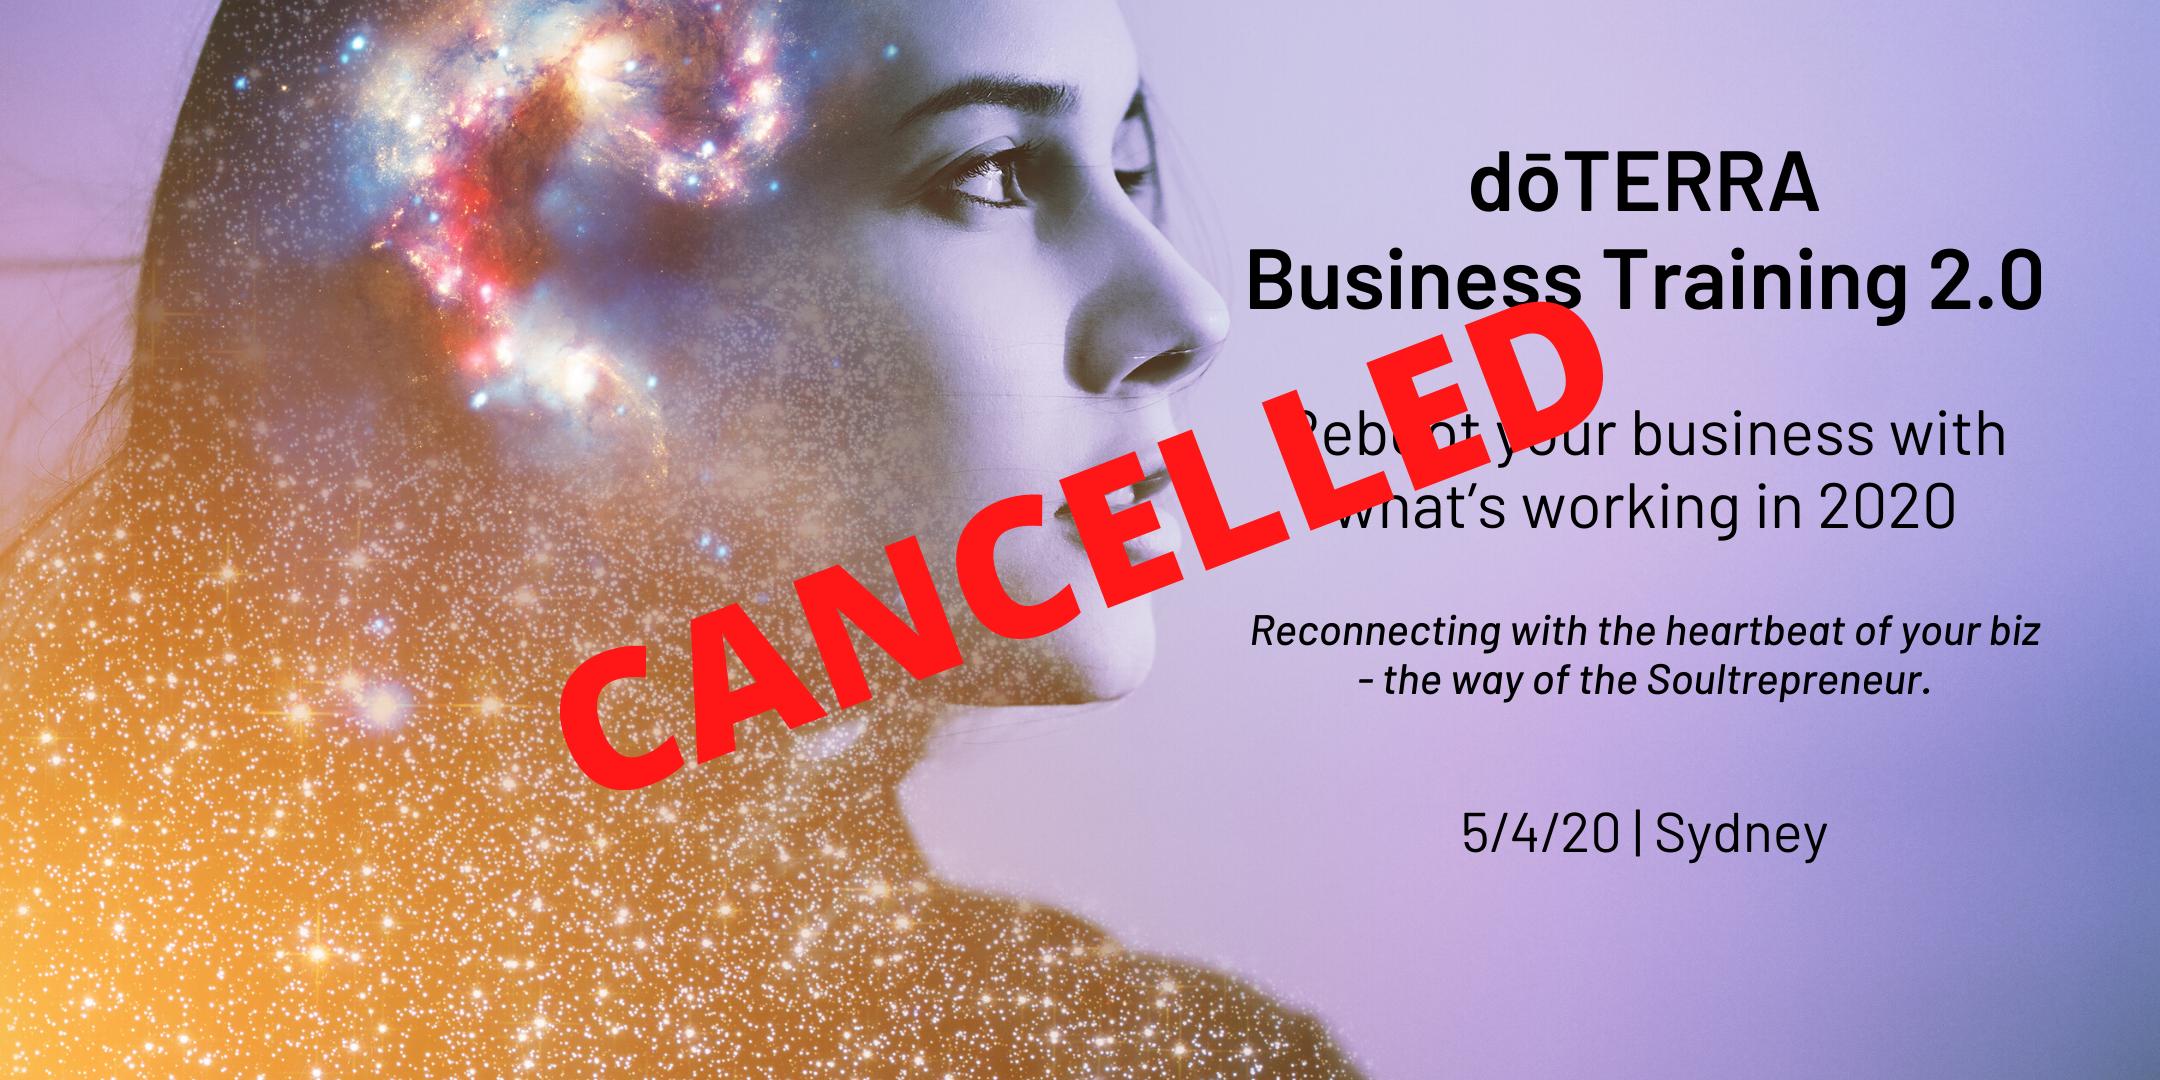 CANCELLED: SYDNEY dōTERRA Business Training 2.0 5/4/20